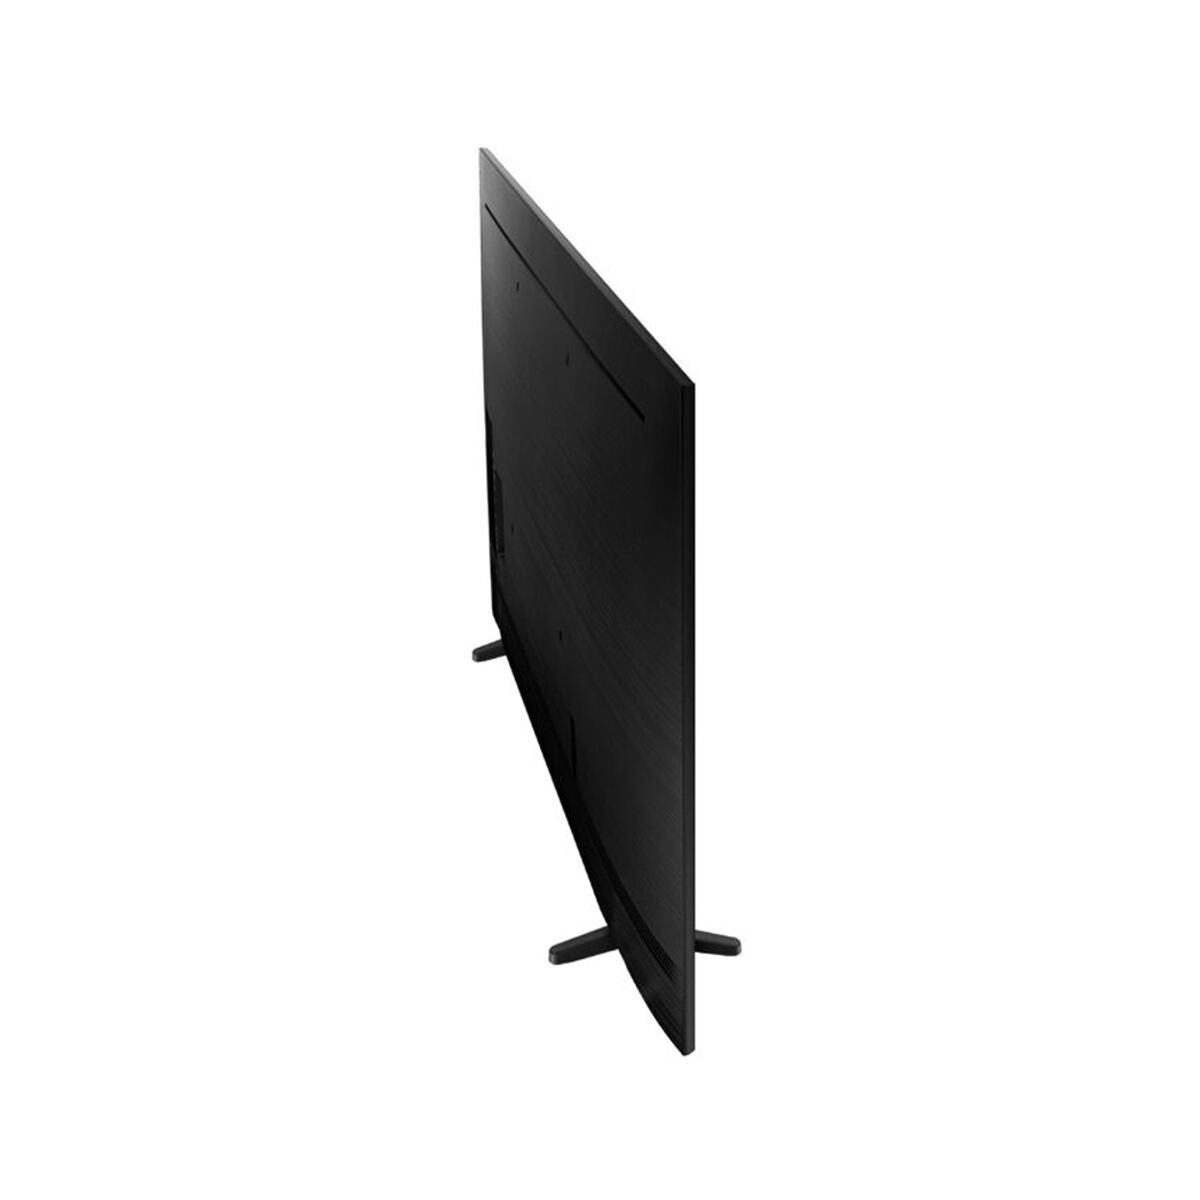 "LED 55"" Samsung UN55NU7000 Smart TV 4K Ultra HD"